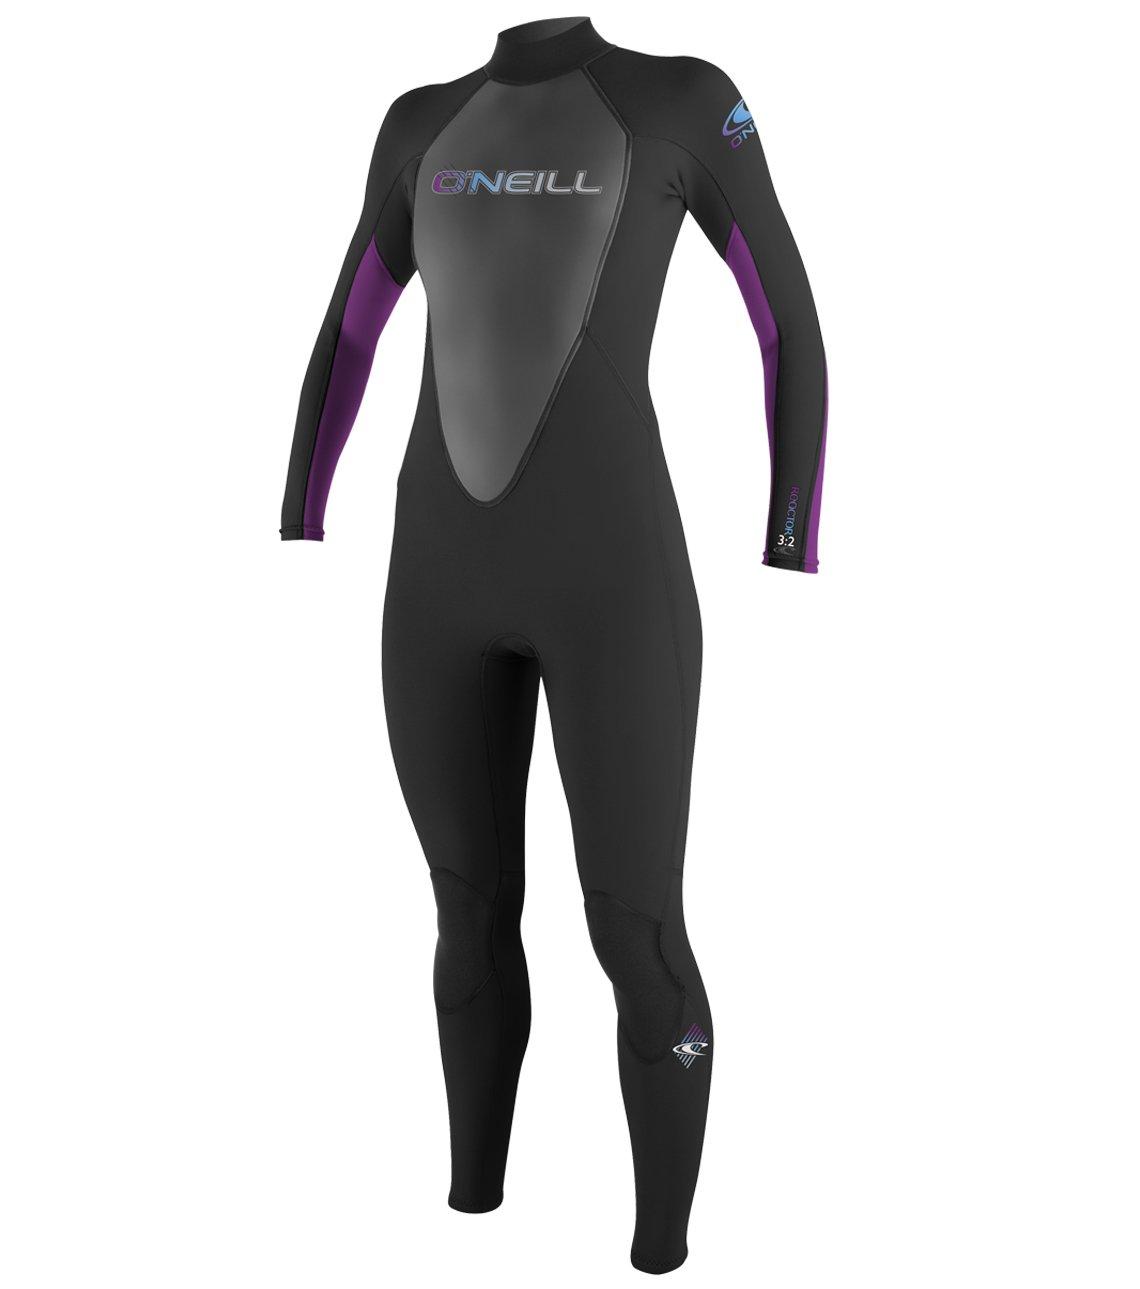 O'Neill Wetsuits Women's Reactor 3/2mm Back Zip Full Wetsuit